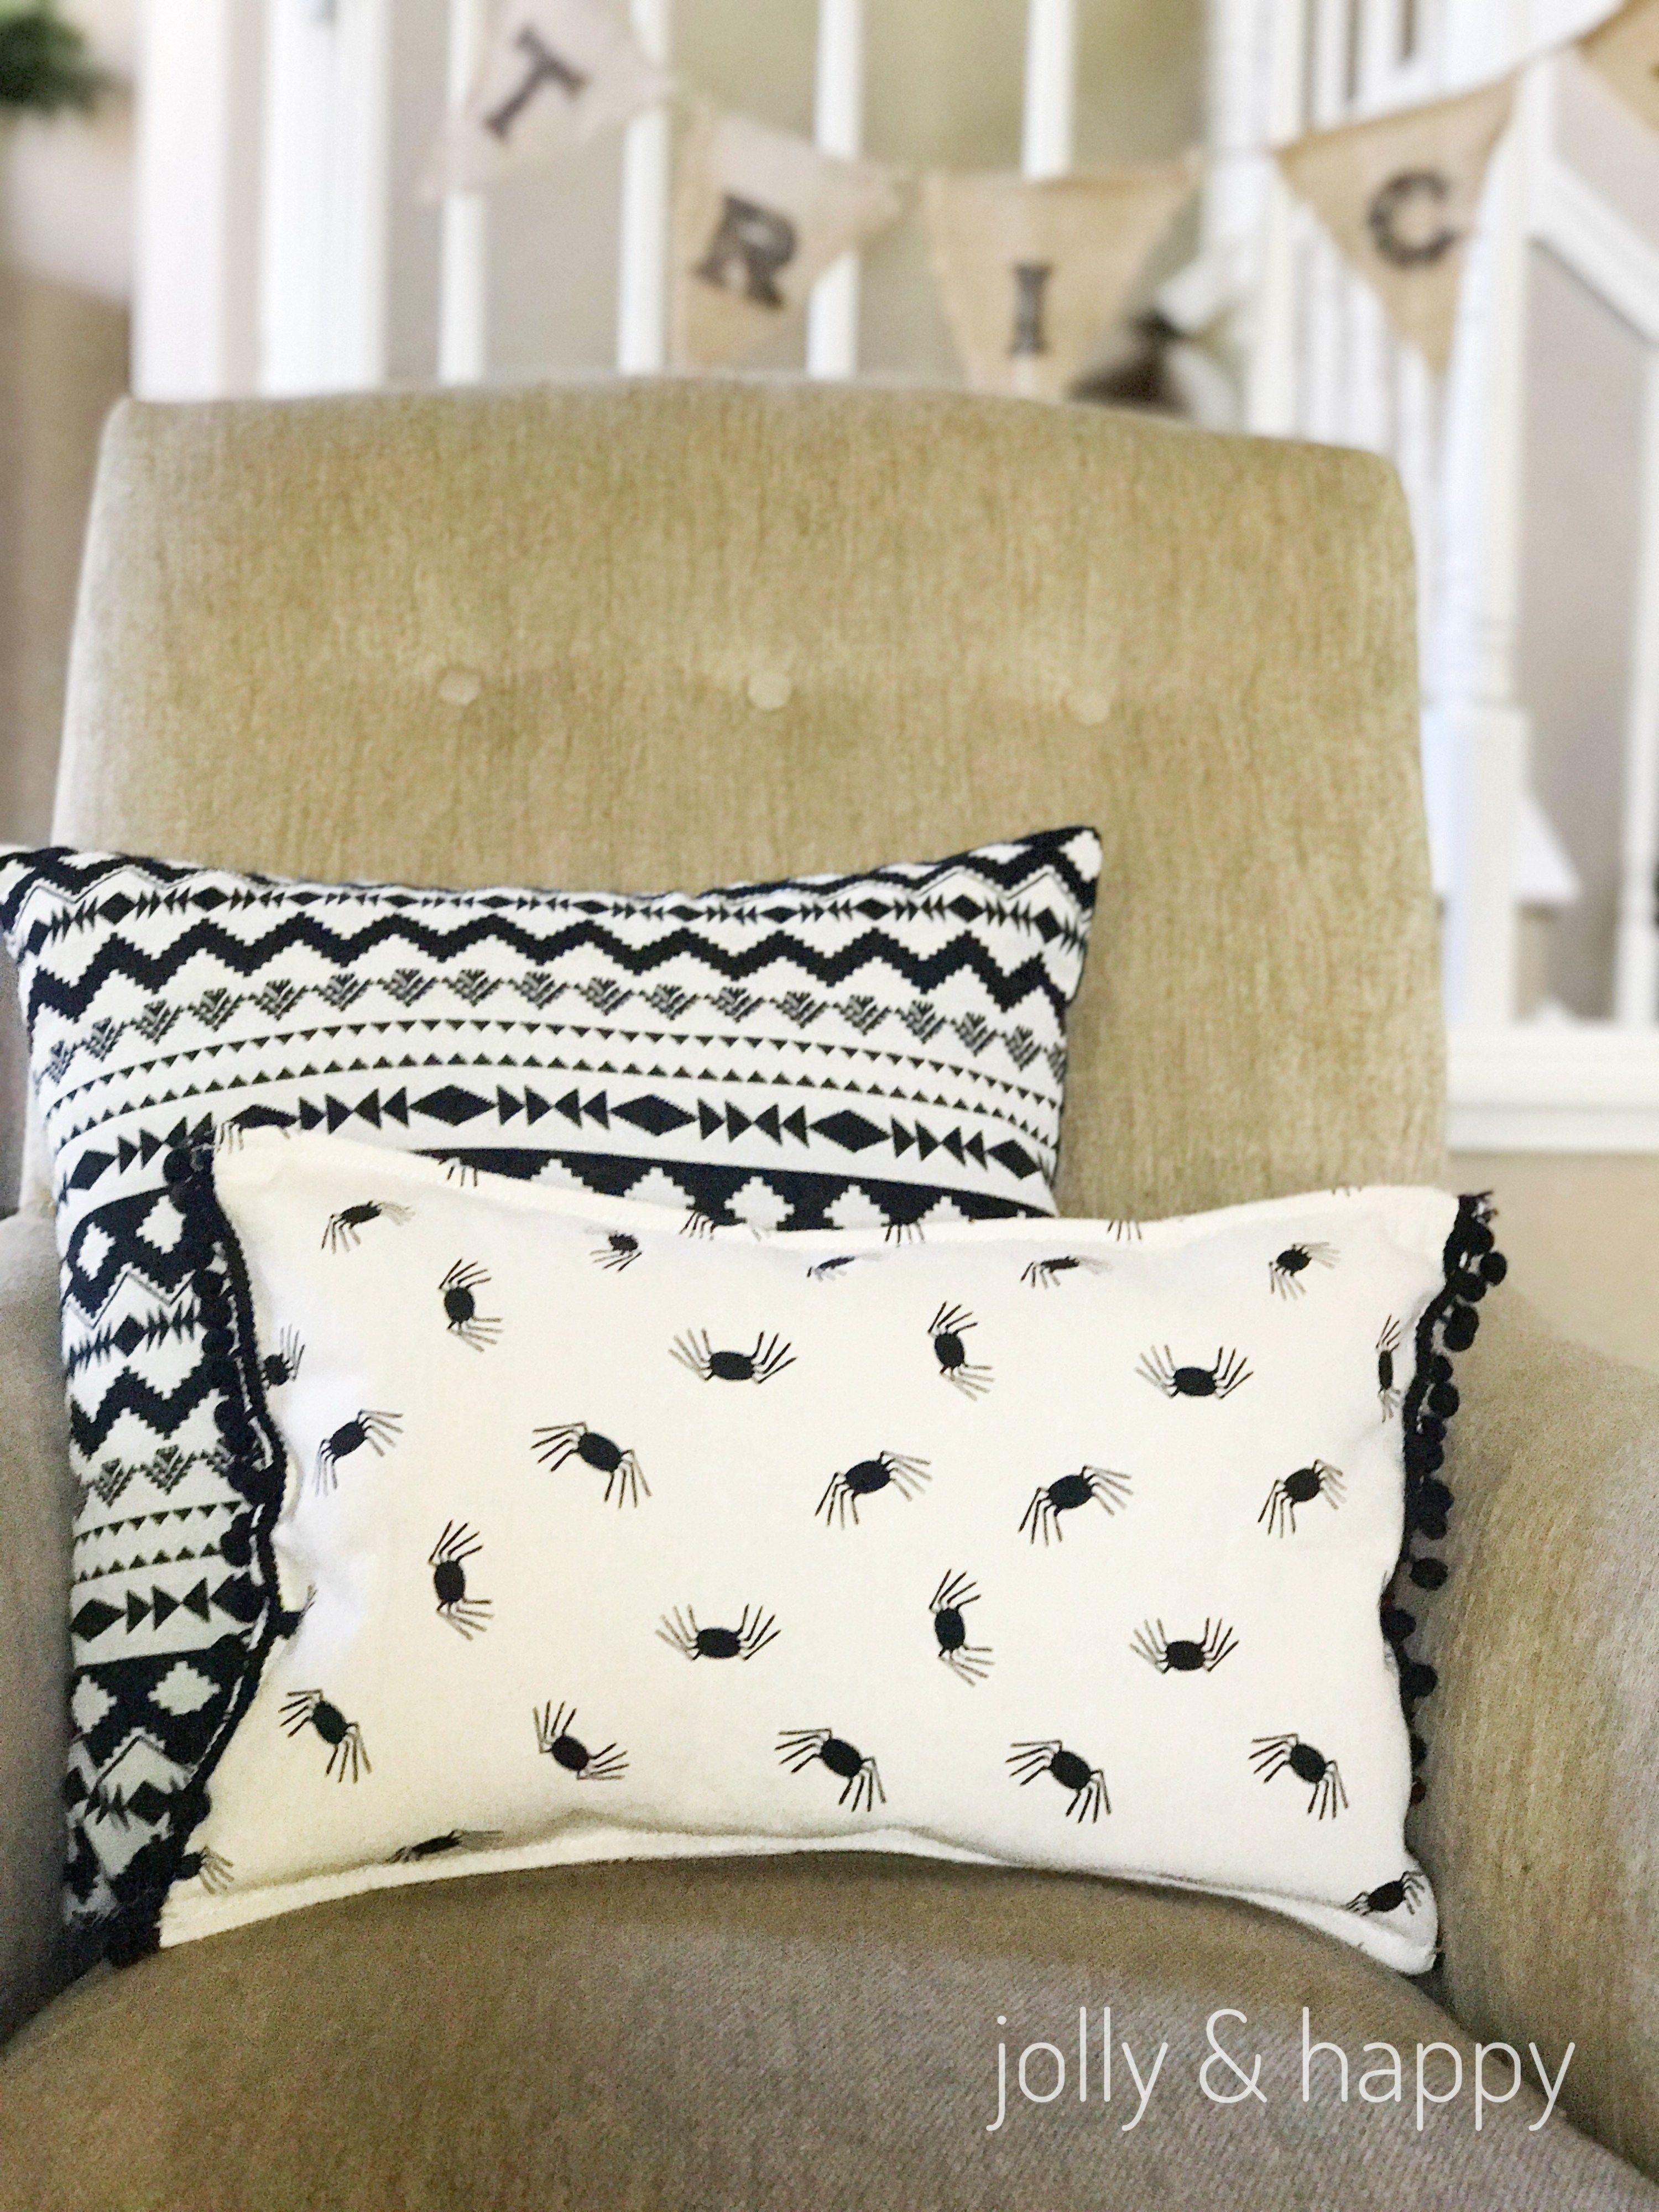 Target Dollar Spot Upcycle Halloween Throw Pillow (With